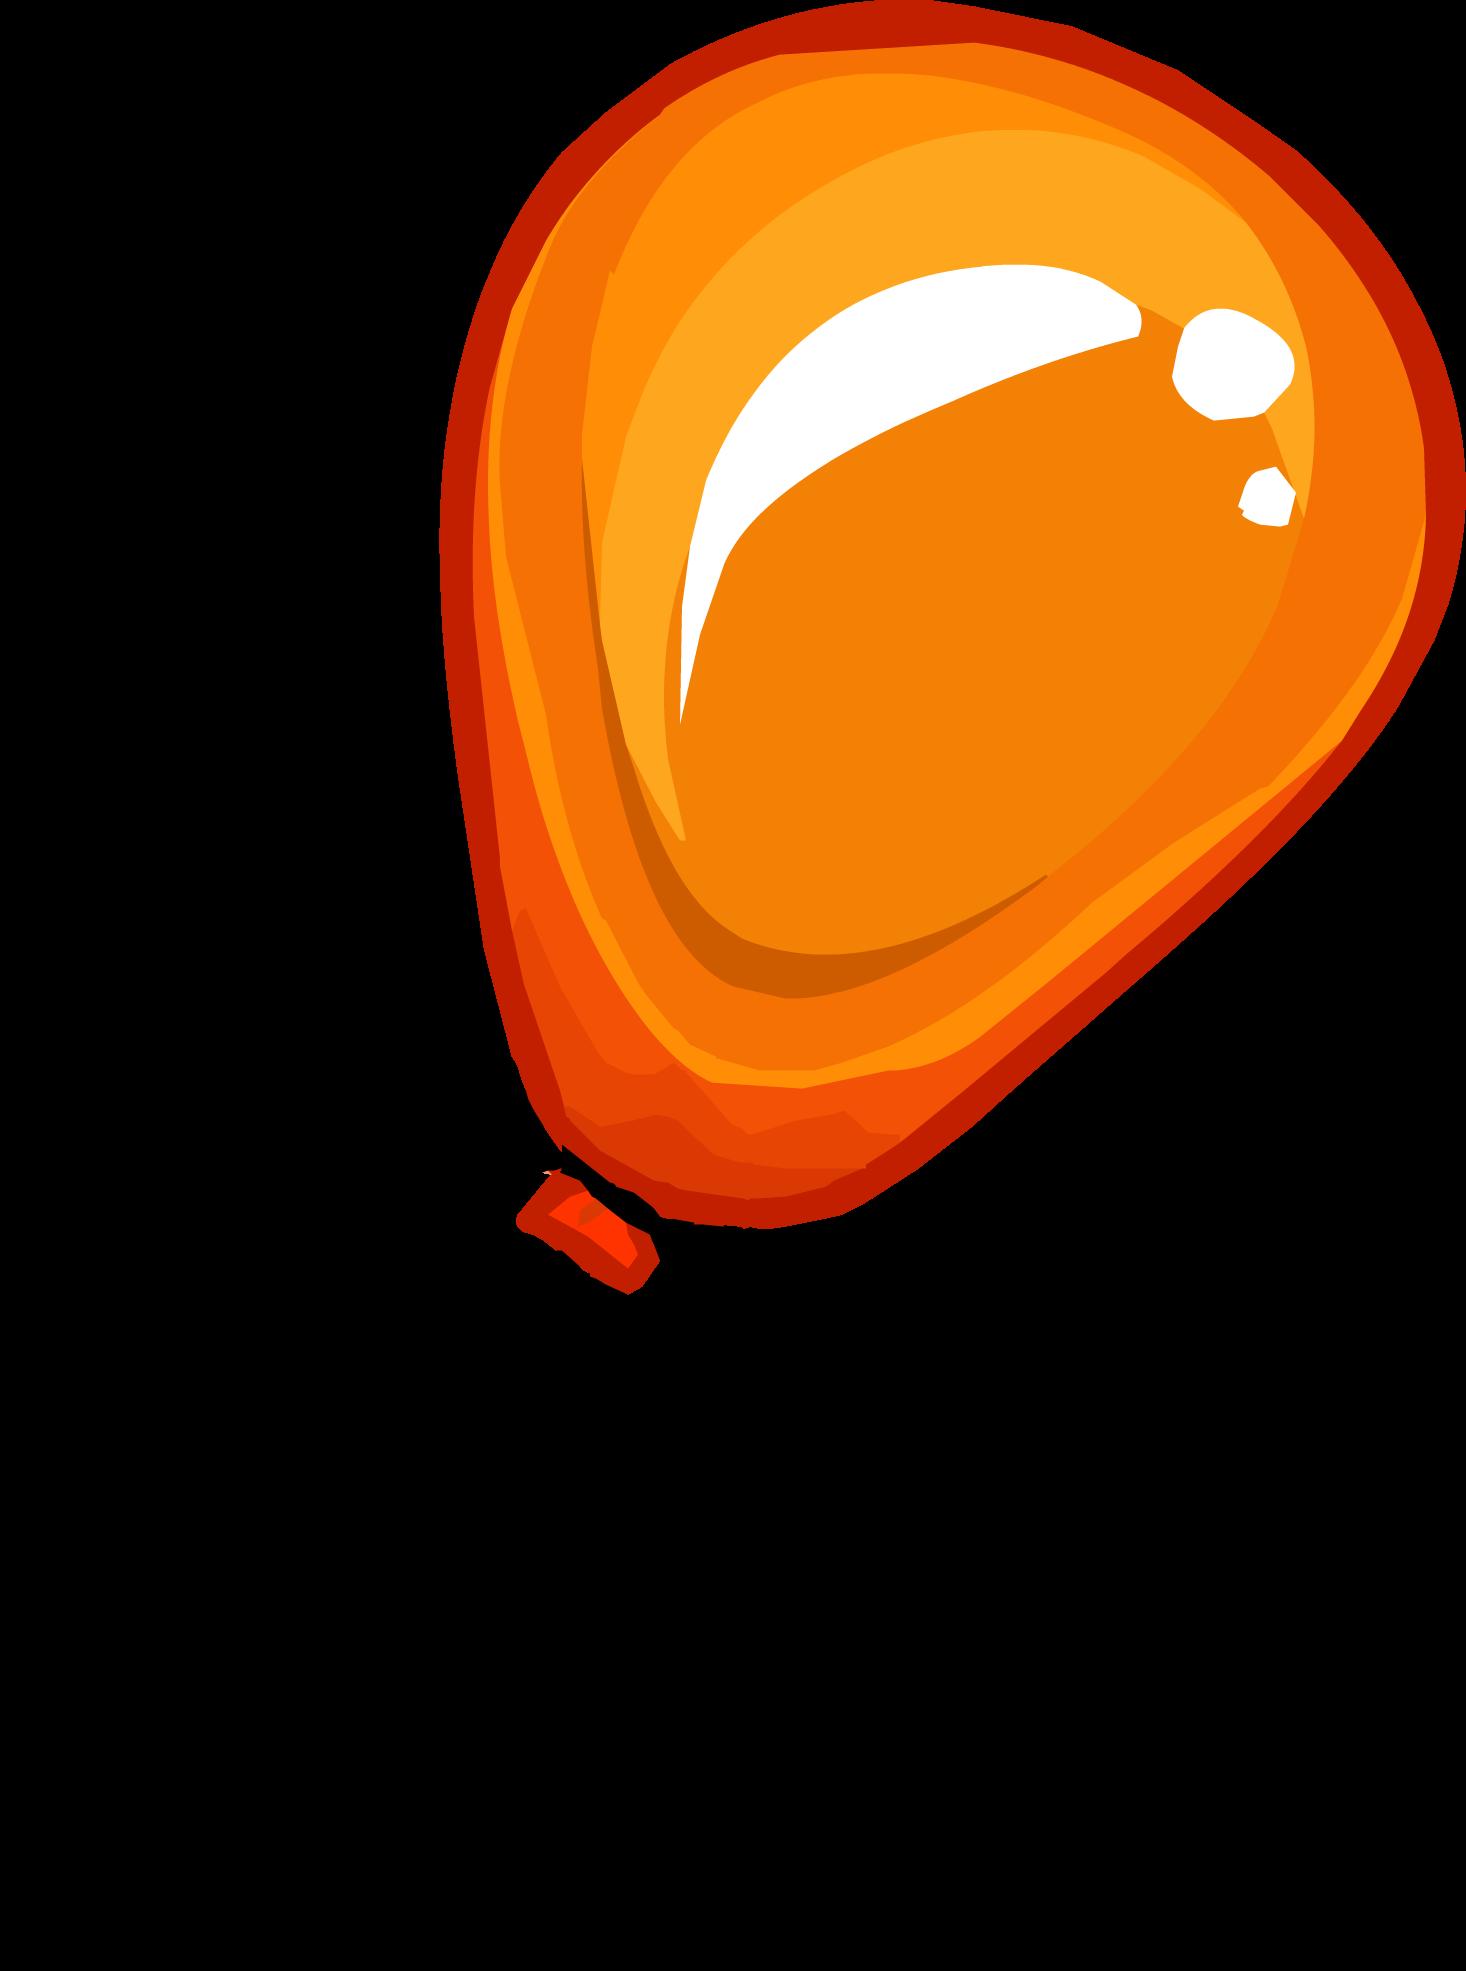 Clipart balloon row. Orange free download best